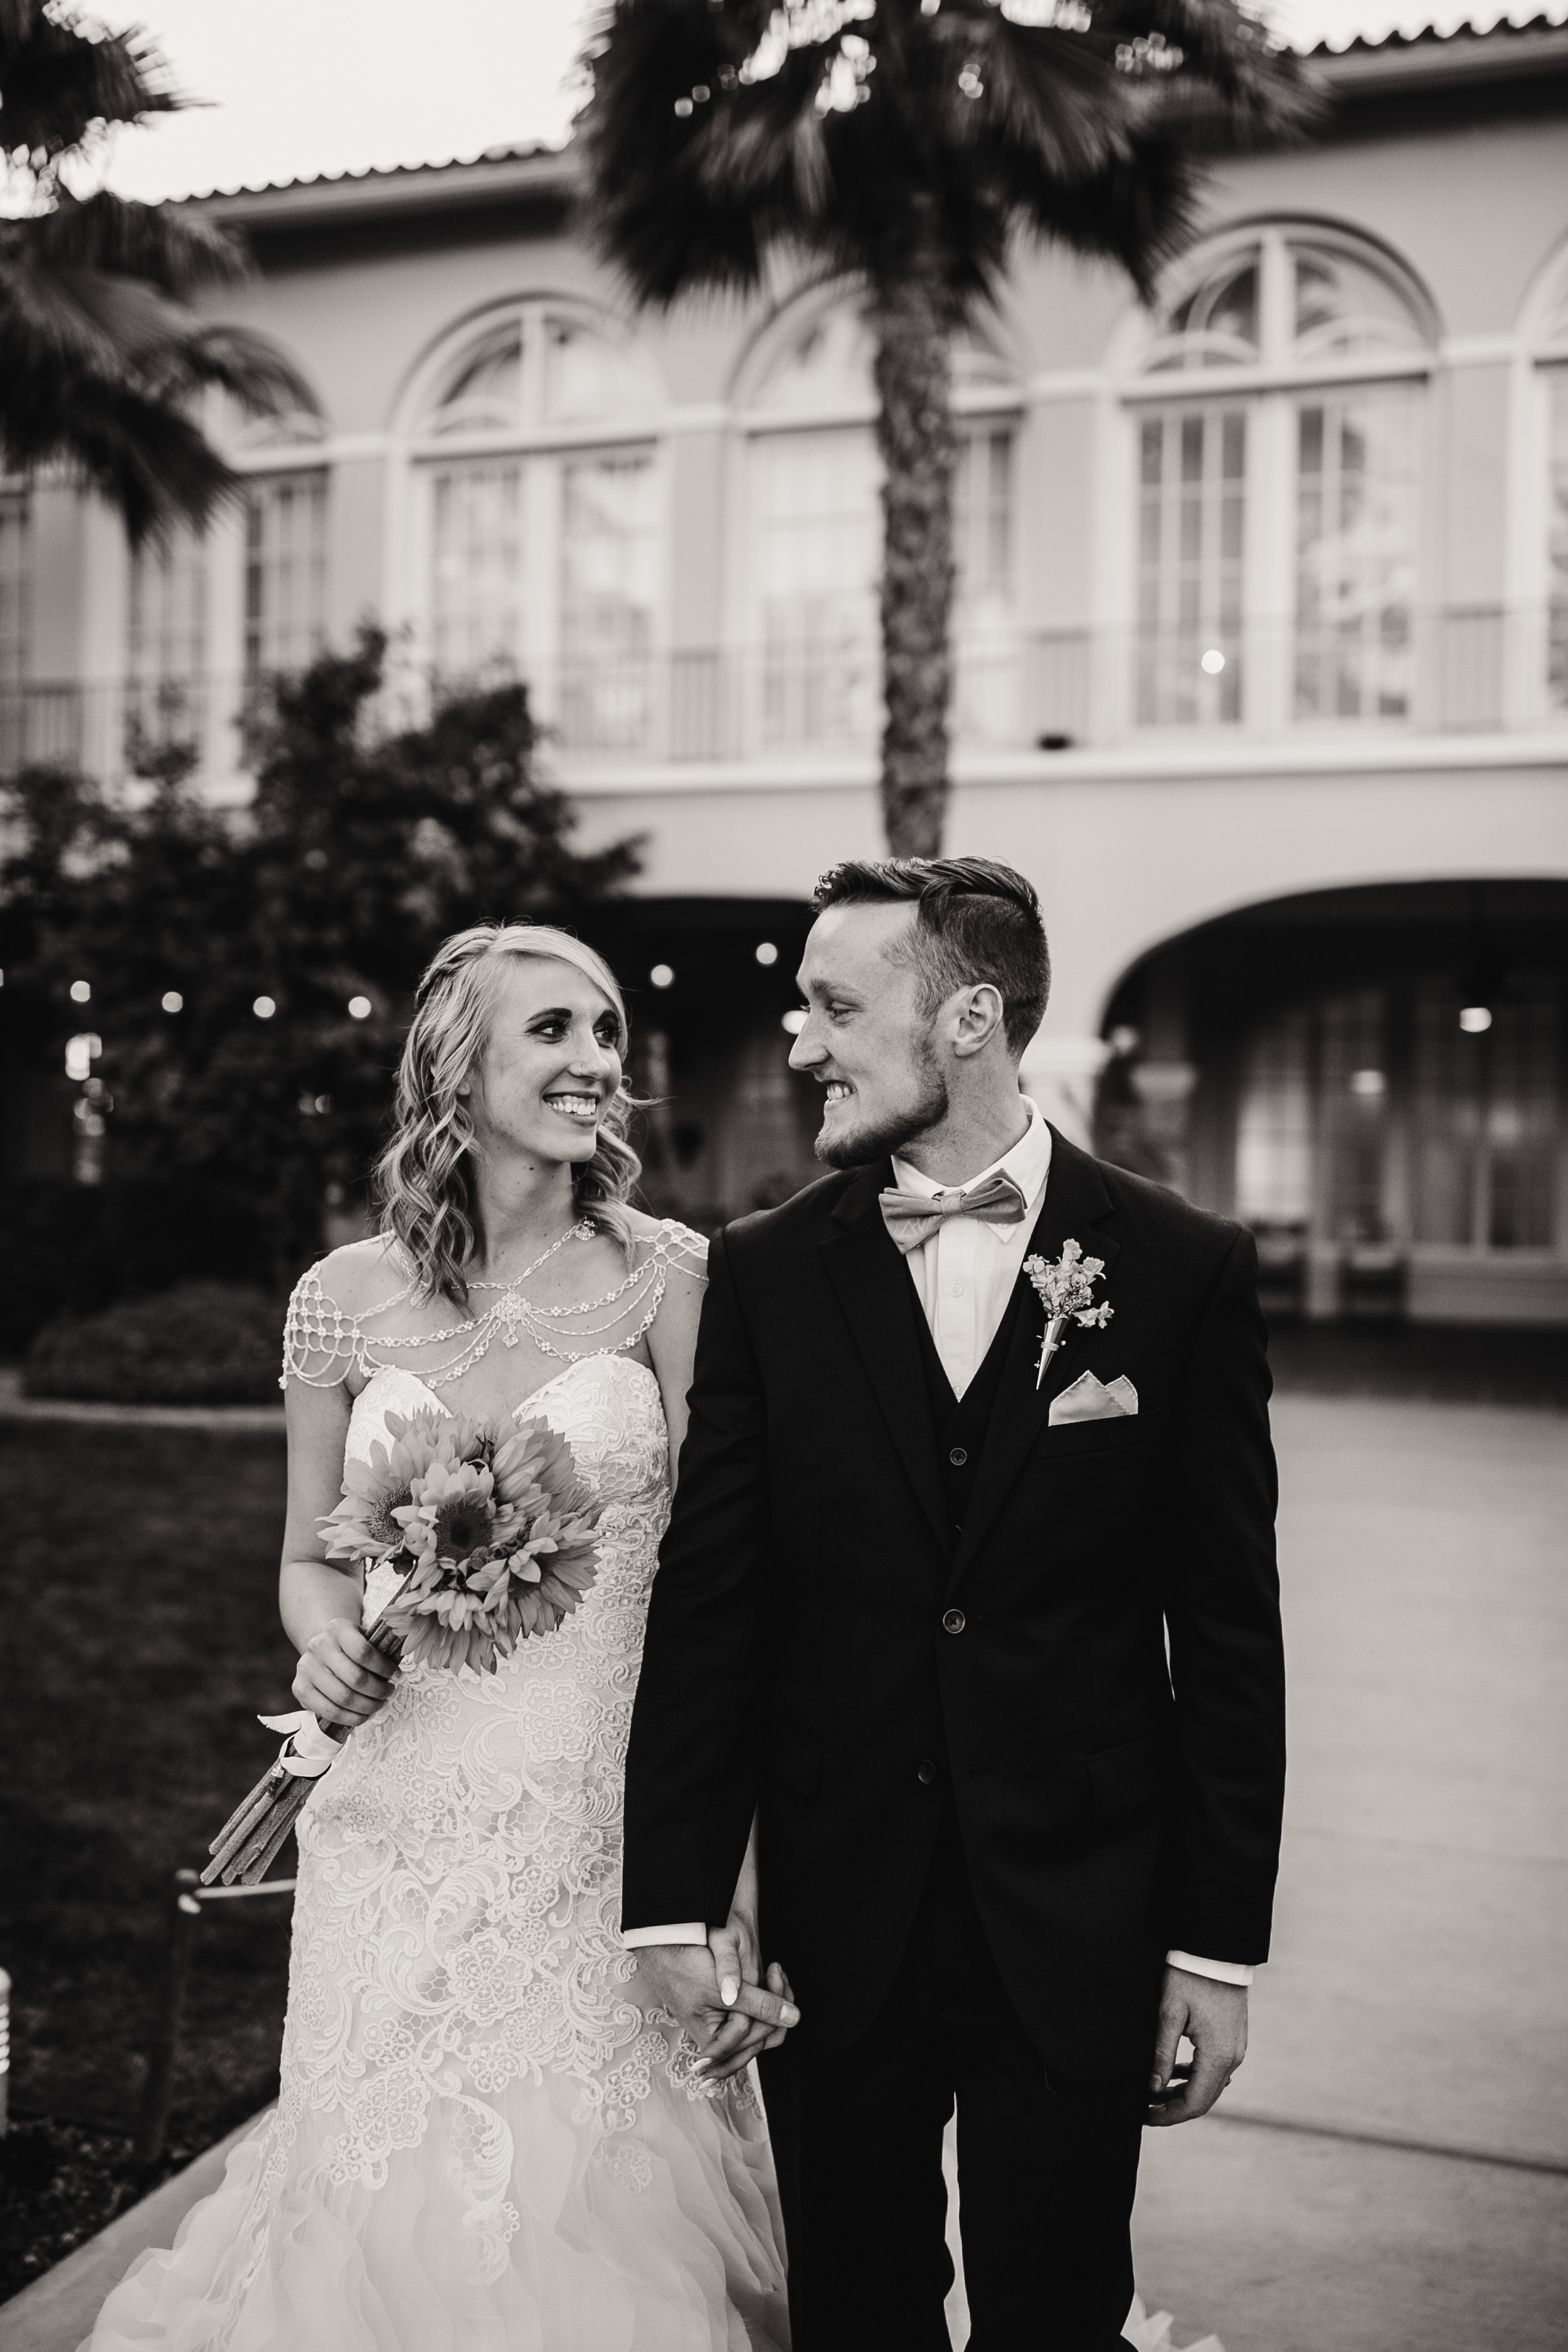 adventure-wedding-photographer-gracetphotography-48.jpg